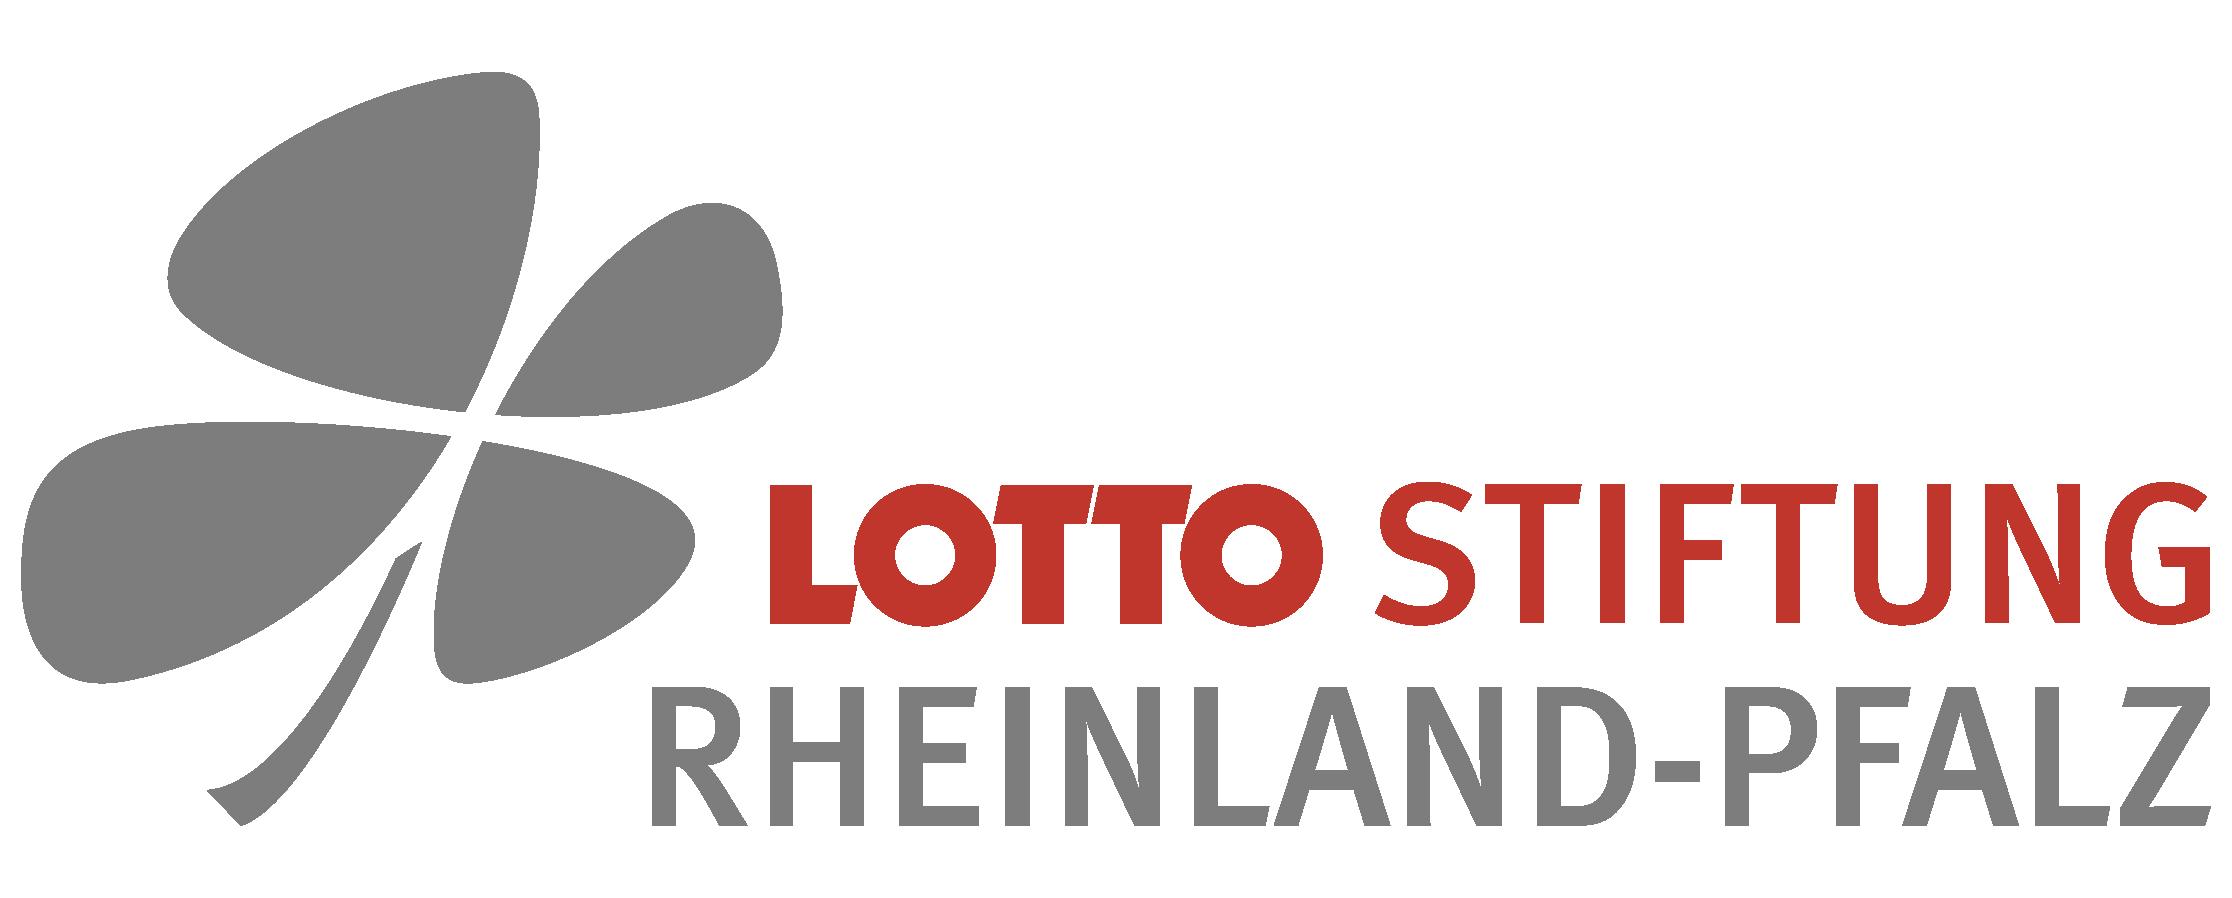 Logo der Lotto Stiftung Rheinland-Pfalz